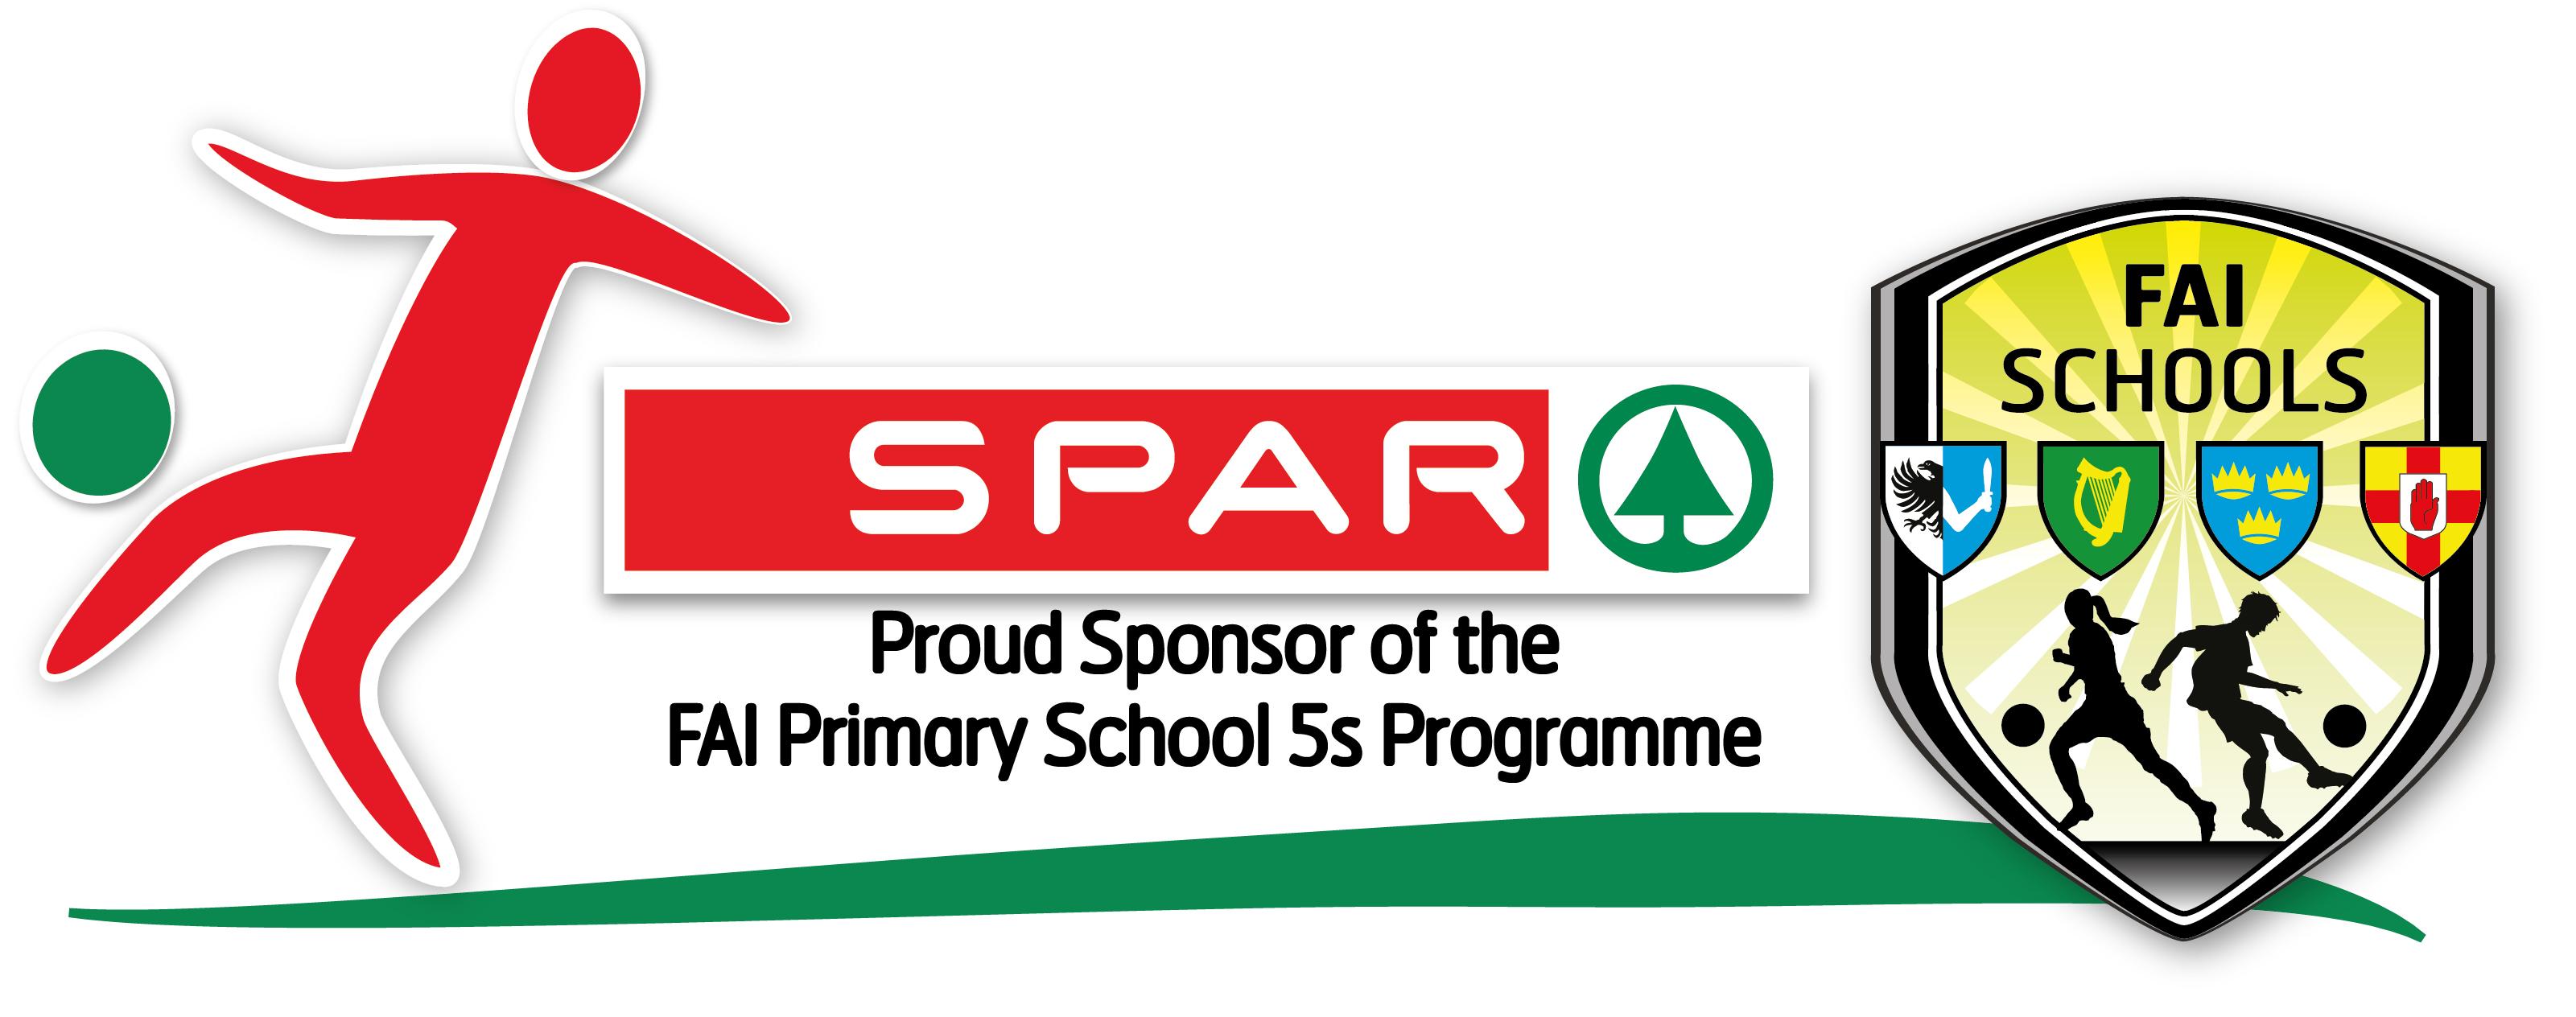 32060_SPAR_FAI_Schools_Logo_JPEG.JPG